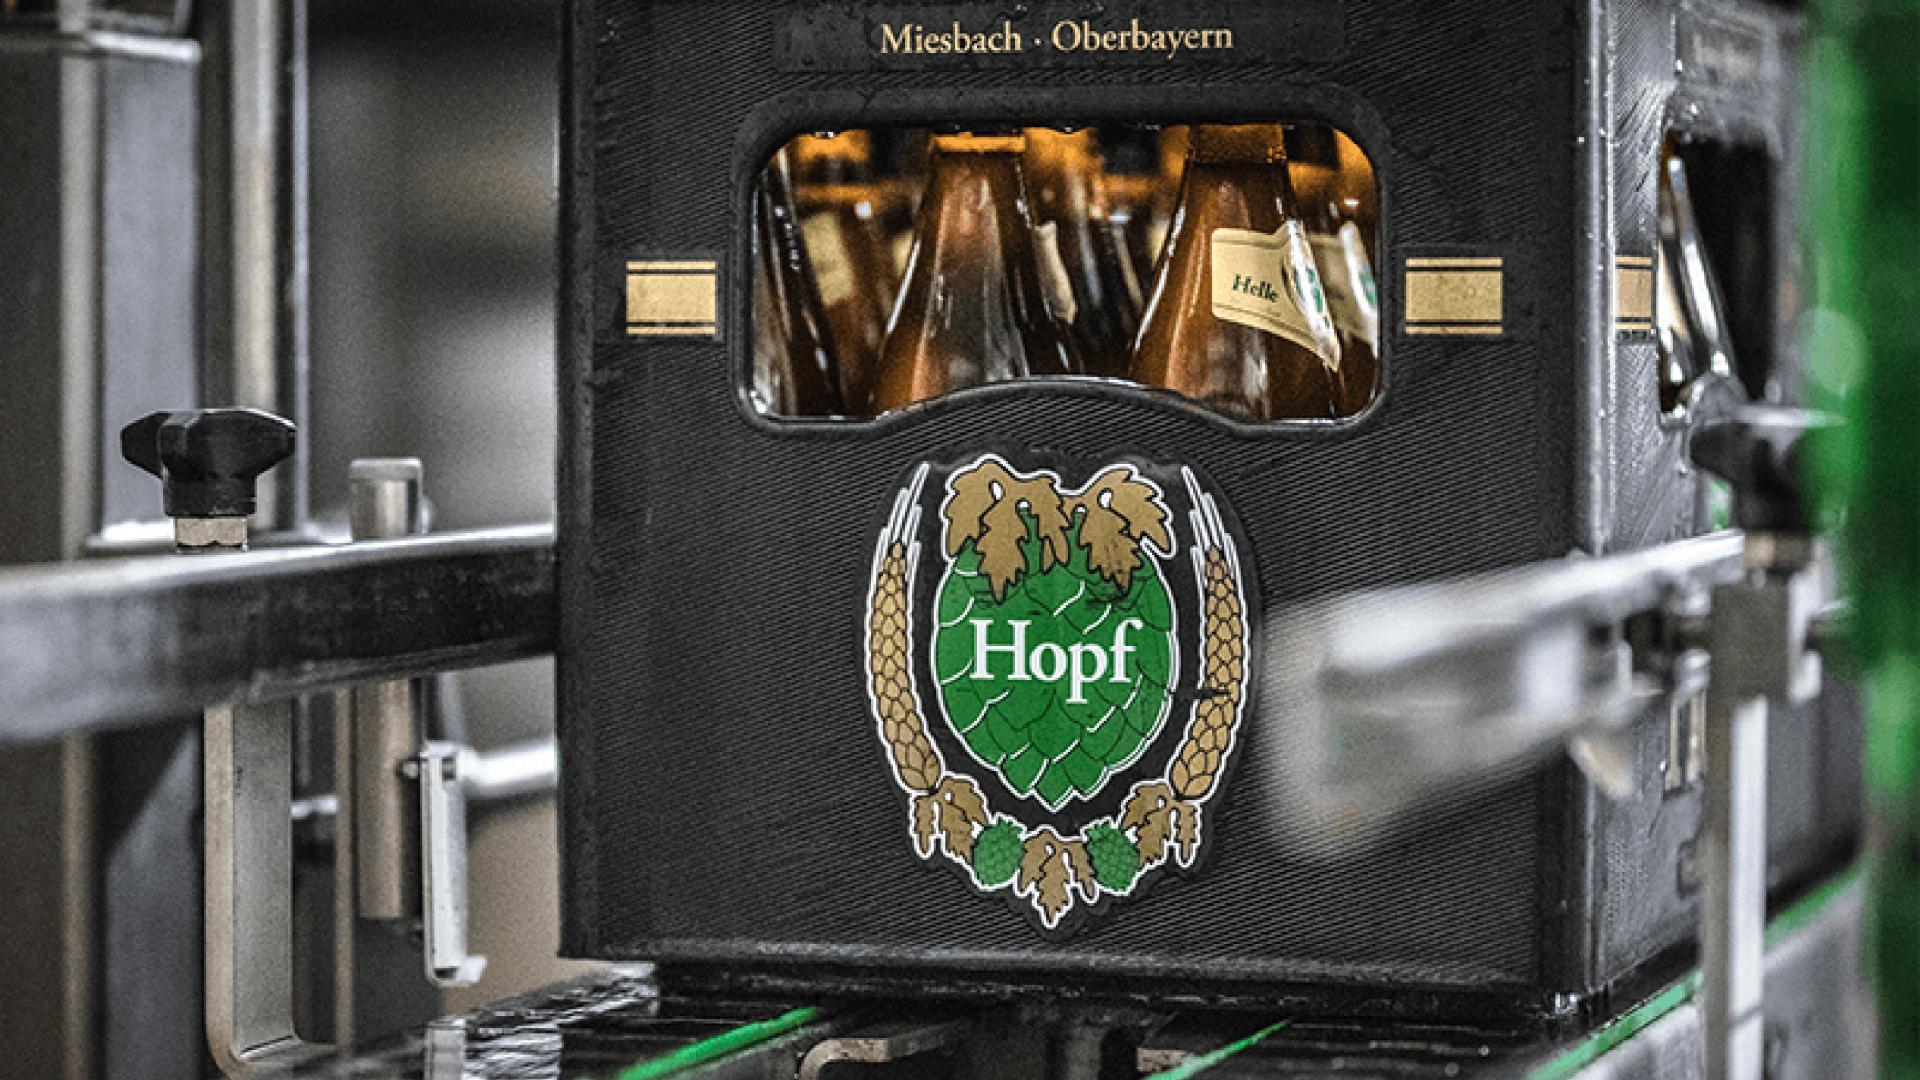 Kasten Hopf Weißbier, © Brauerei Hopf